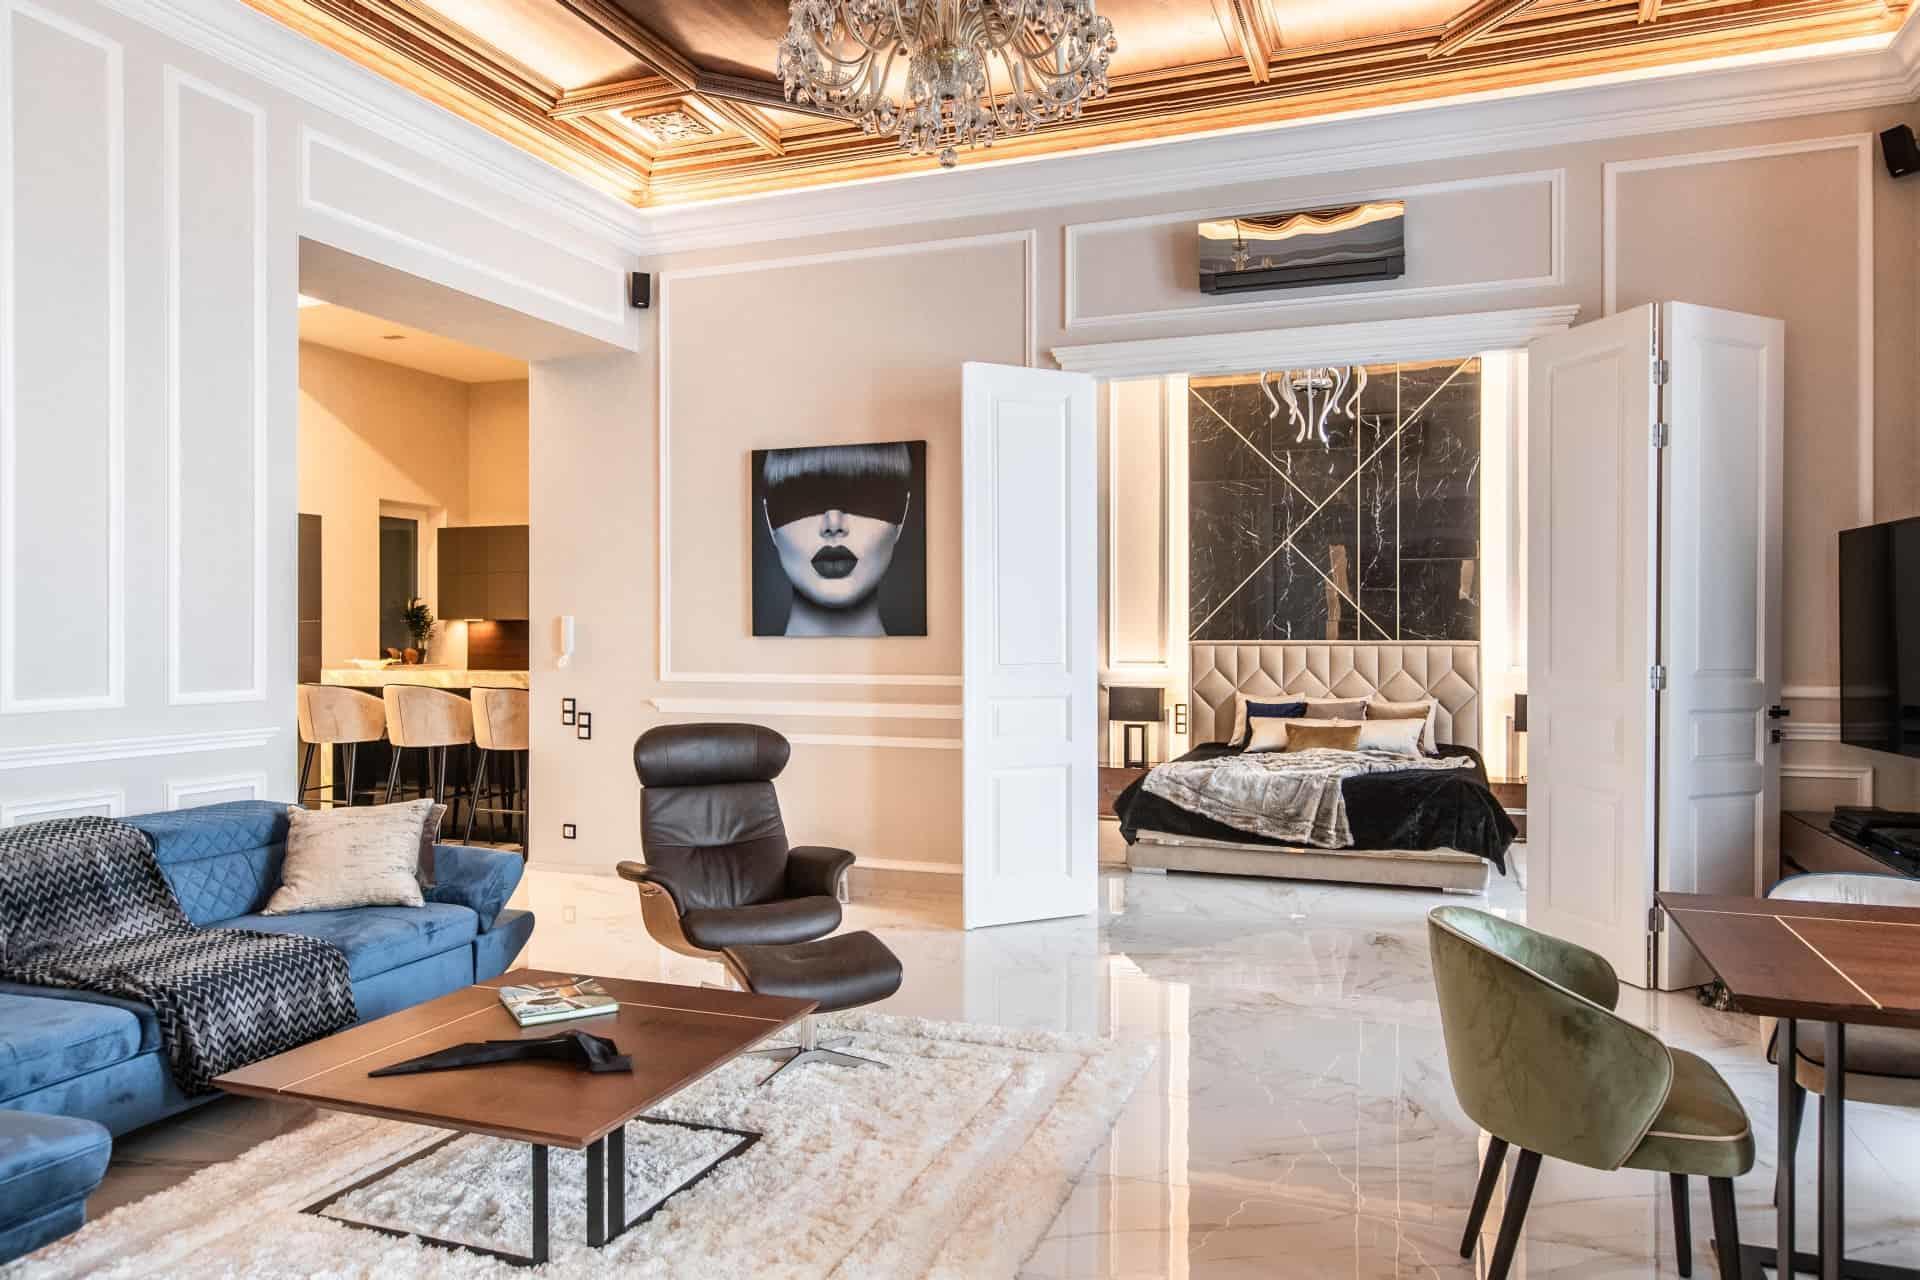 Appartement Meuble Luxueusement A Vendre A Budapest 3 Chambres